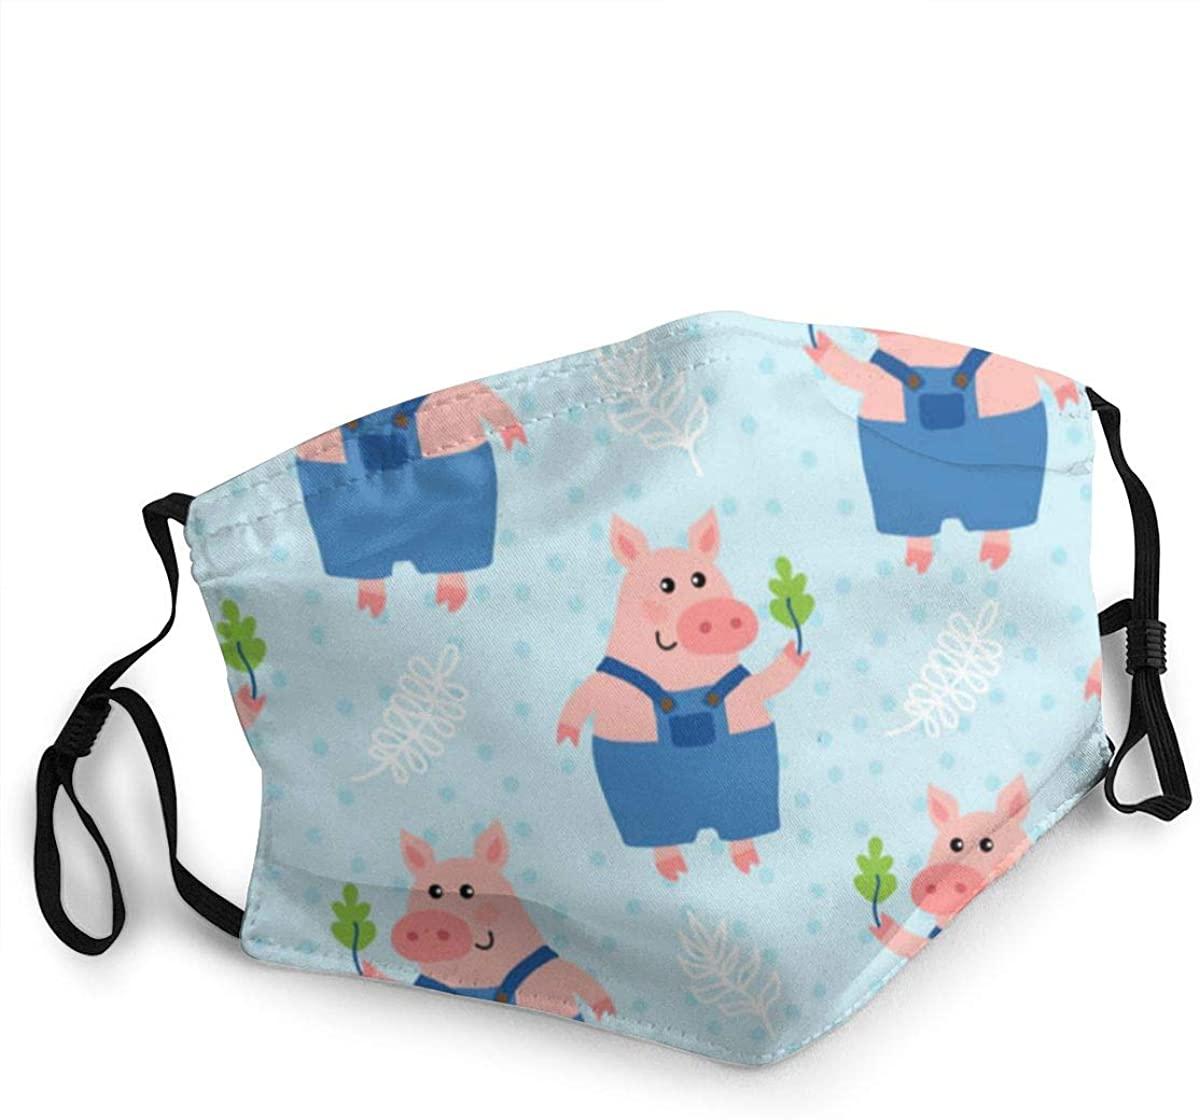 Fashion Protective Face Masks, Cute Cartoon Pig Unisex Dust Mouth Masks, Washable, Reusable Masks